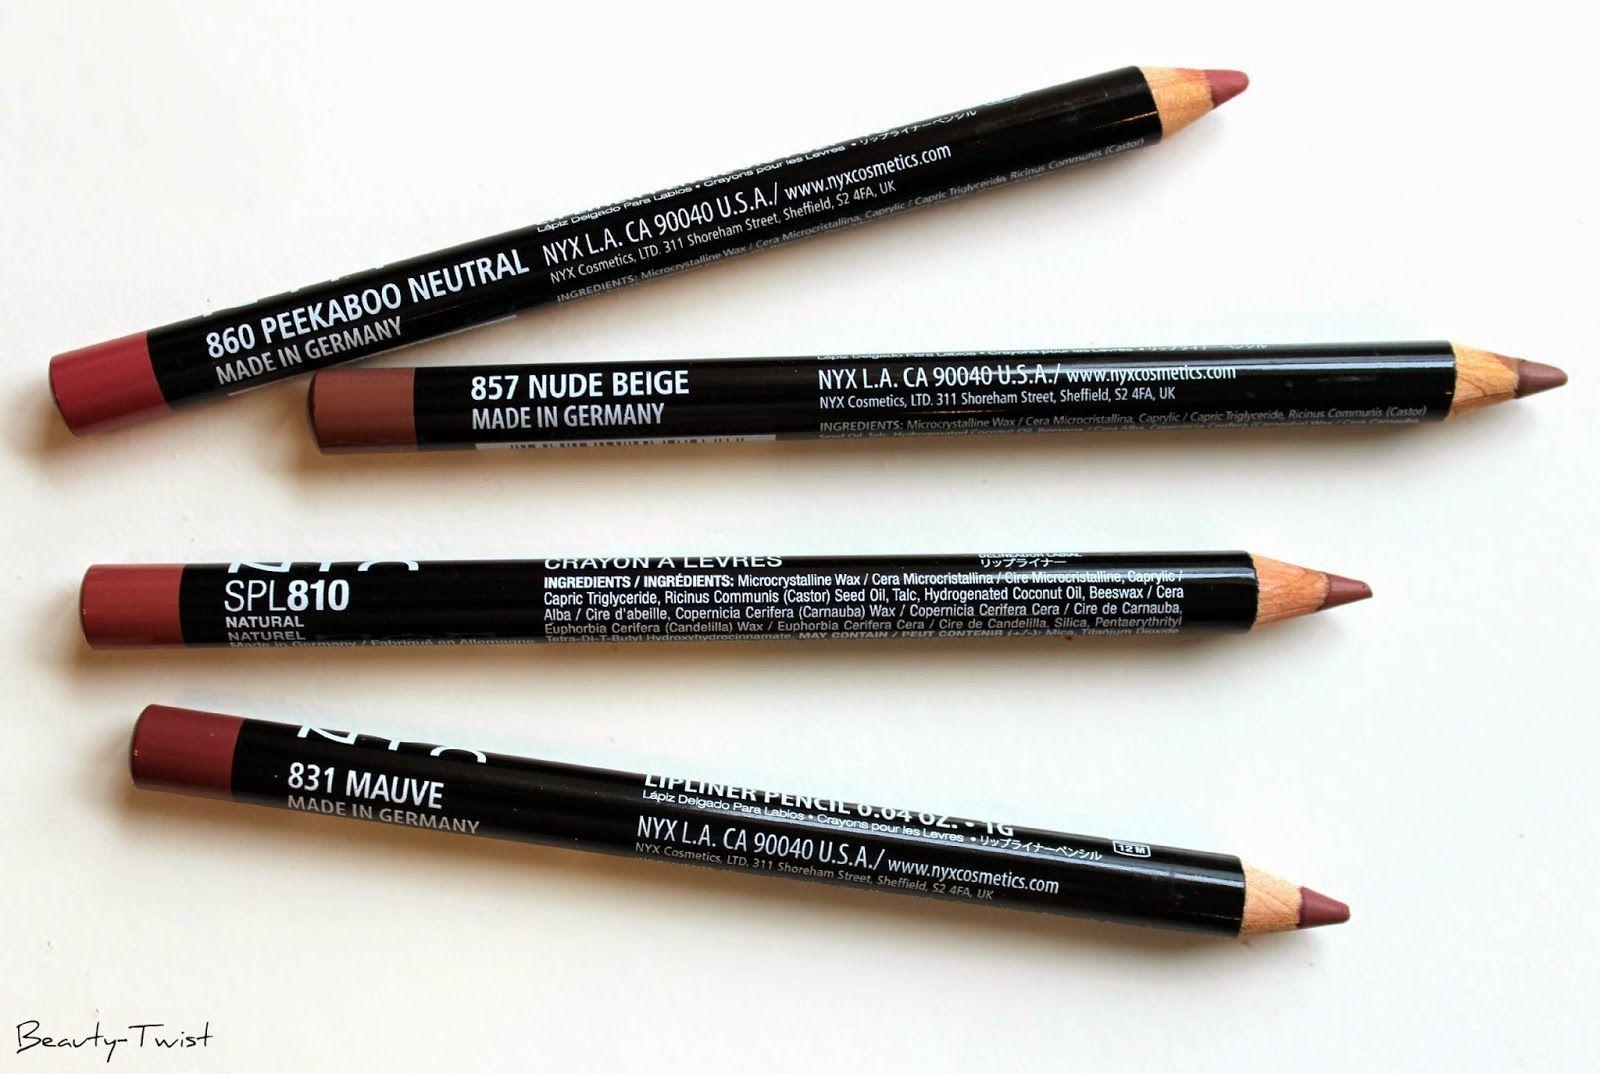 nyx peekaboo neutral lip liner review